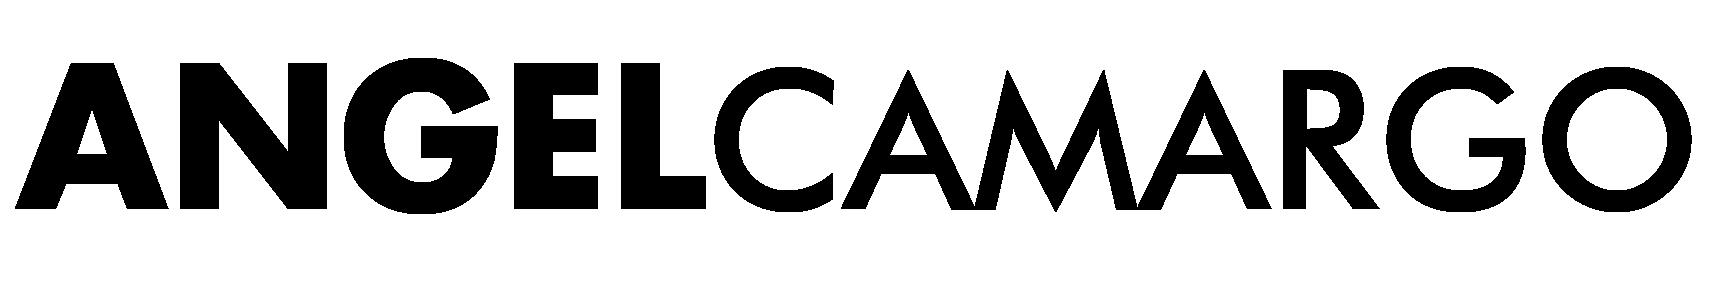 Logo de Angel Camargo - Consultor de Marketing Digital